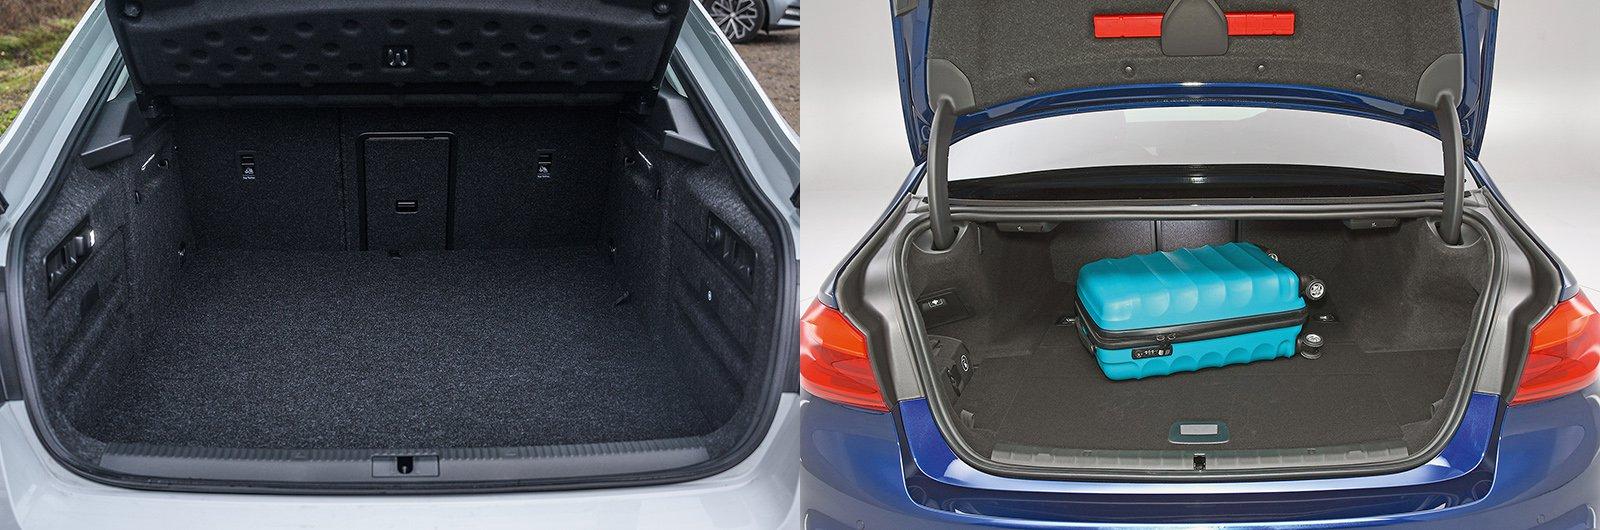 New Skoda Superb iV vs used BMW 530e: – space & practicality